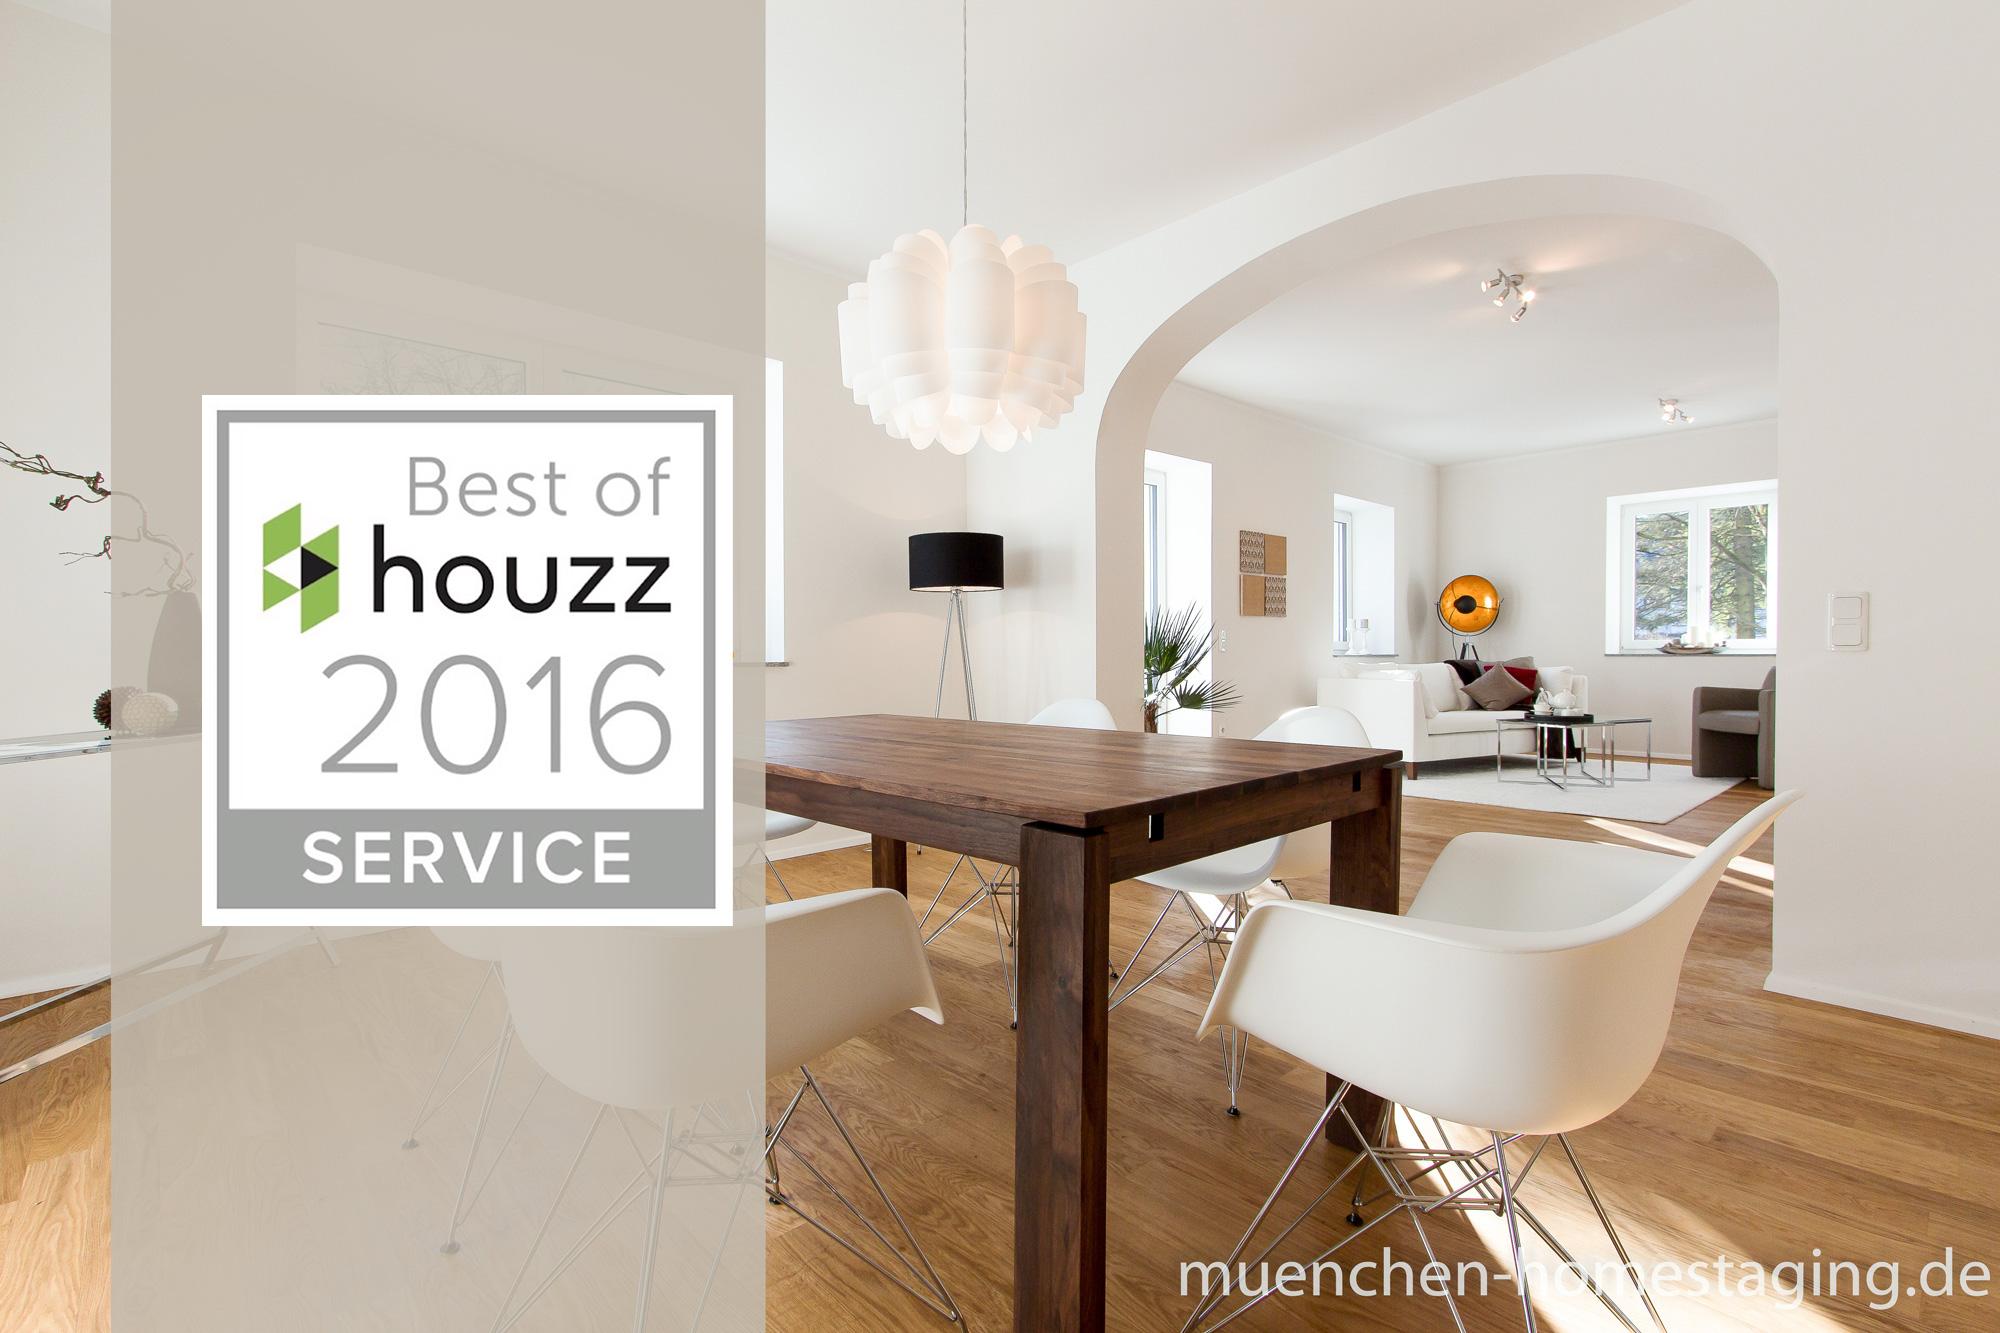 Münchner Homestaging Agentur – Award